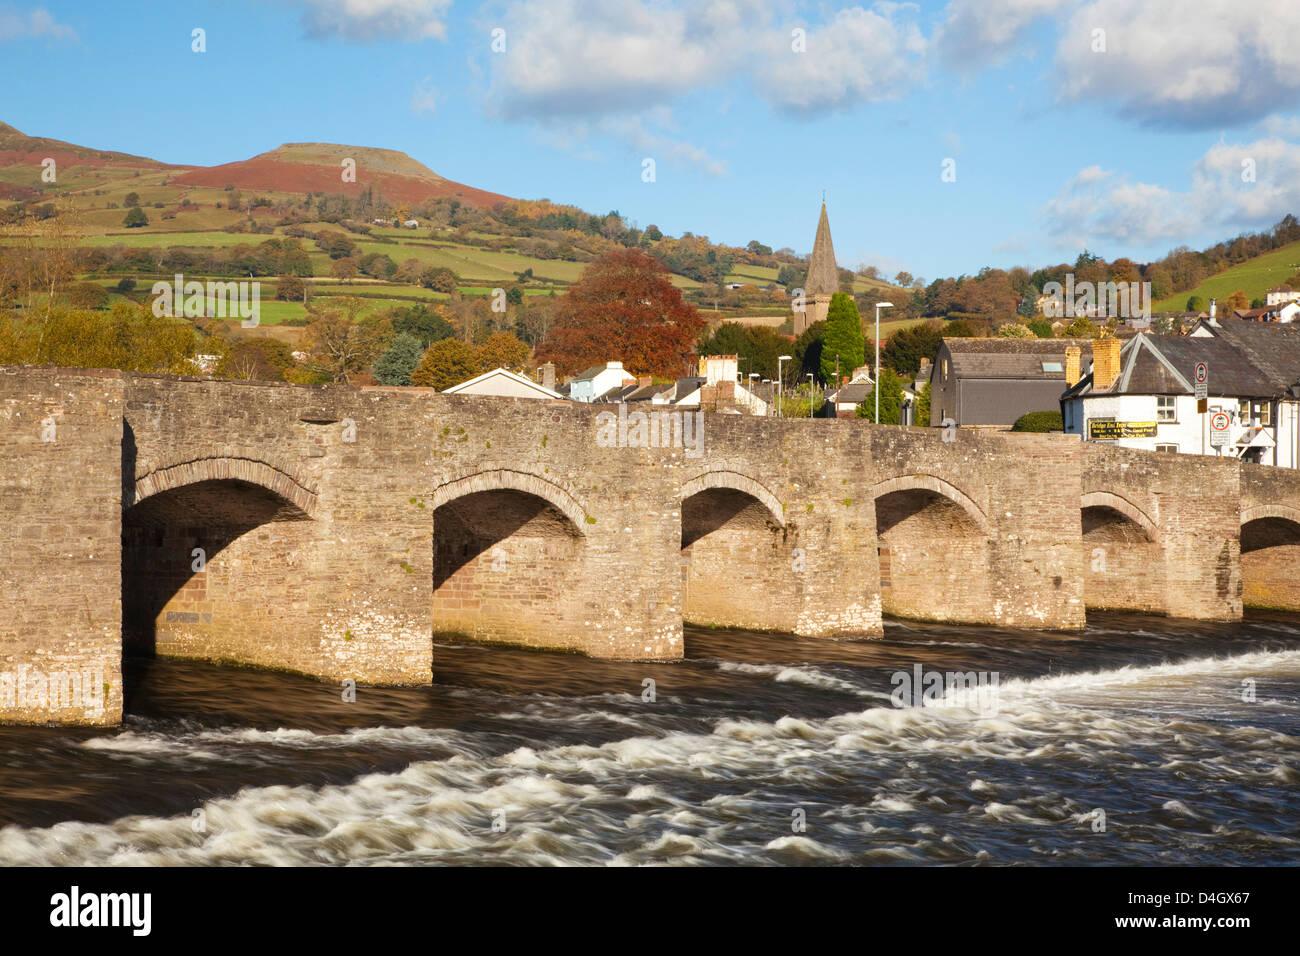 Bridge over River Usk, Crickhowell, Powys, Wales, UK - Stock Image